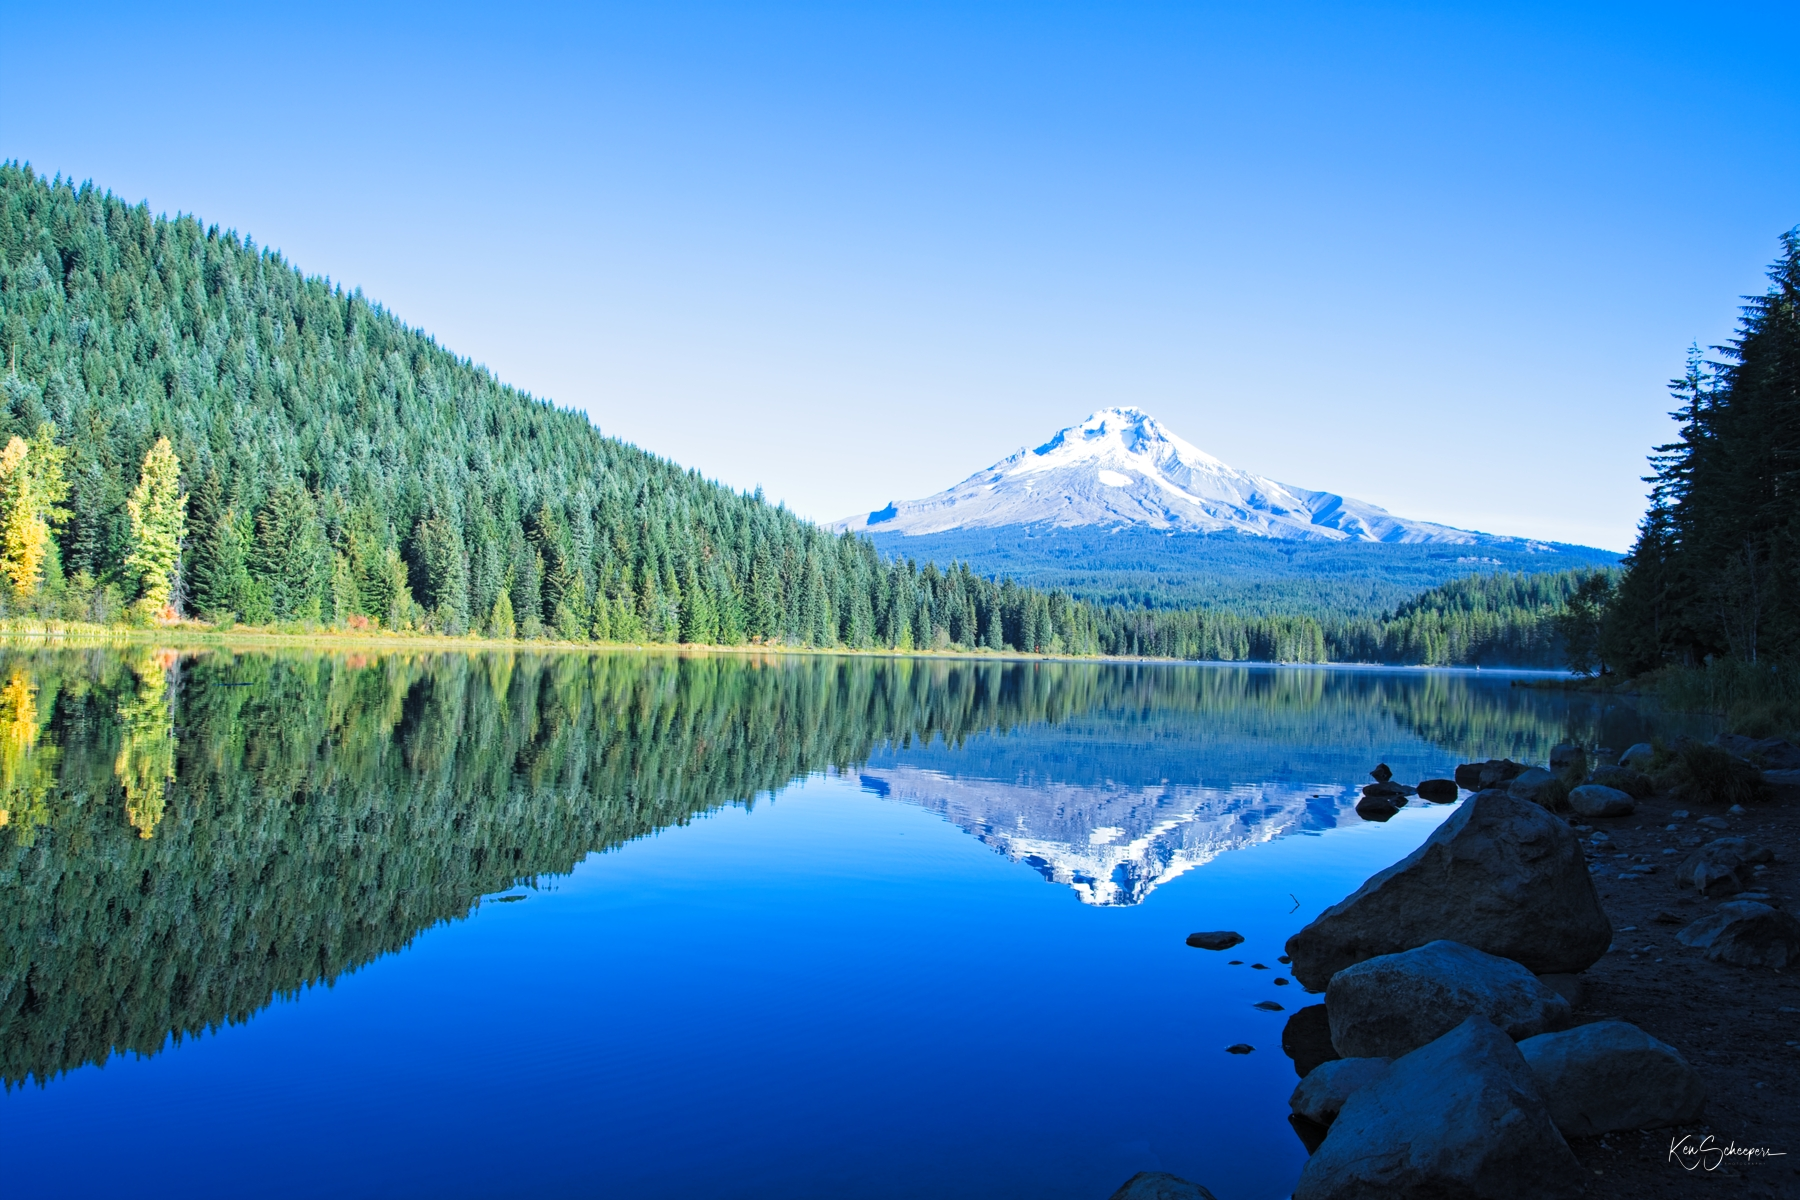 Trillium Lake, Oregon with Mt. Hood